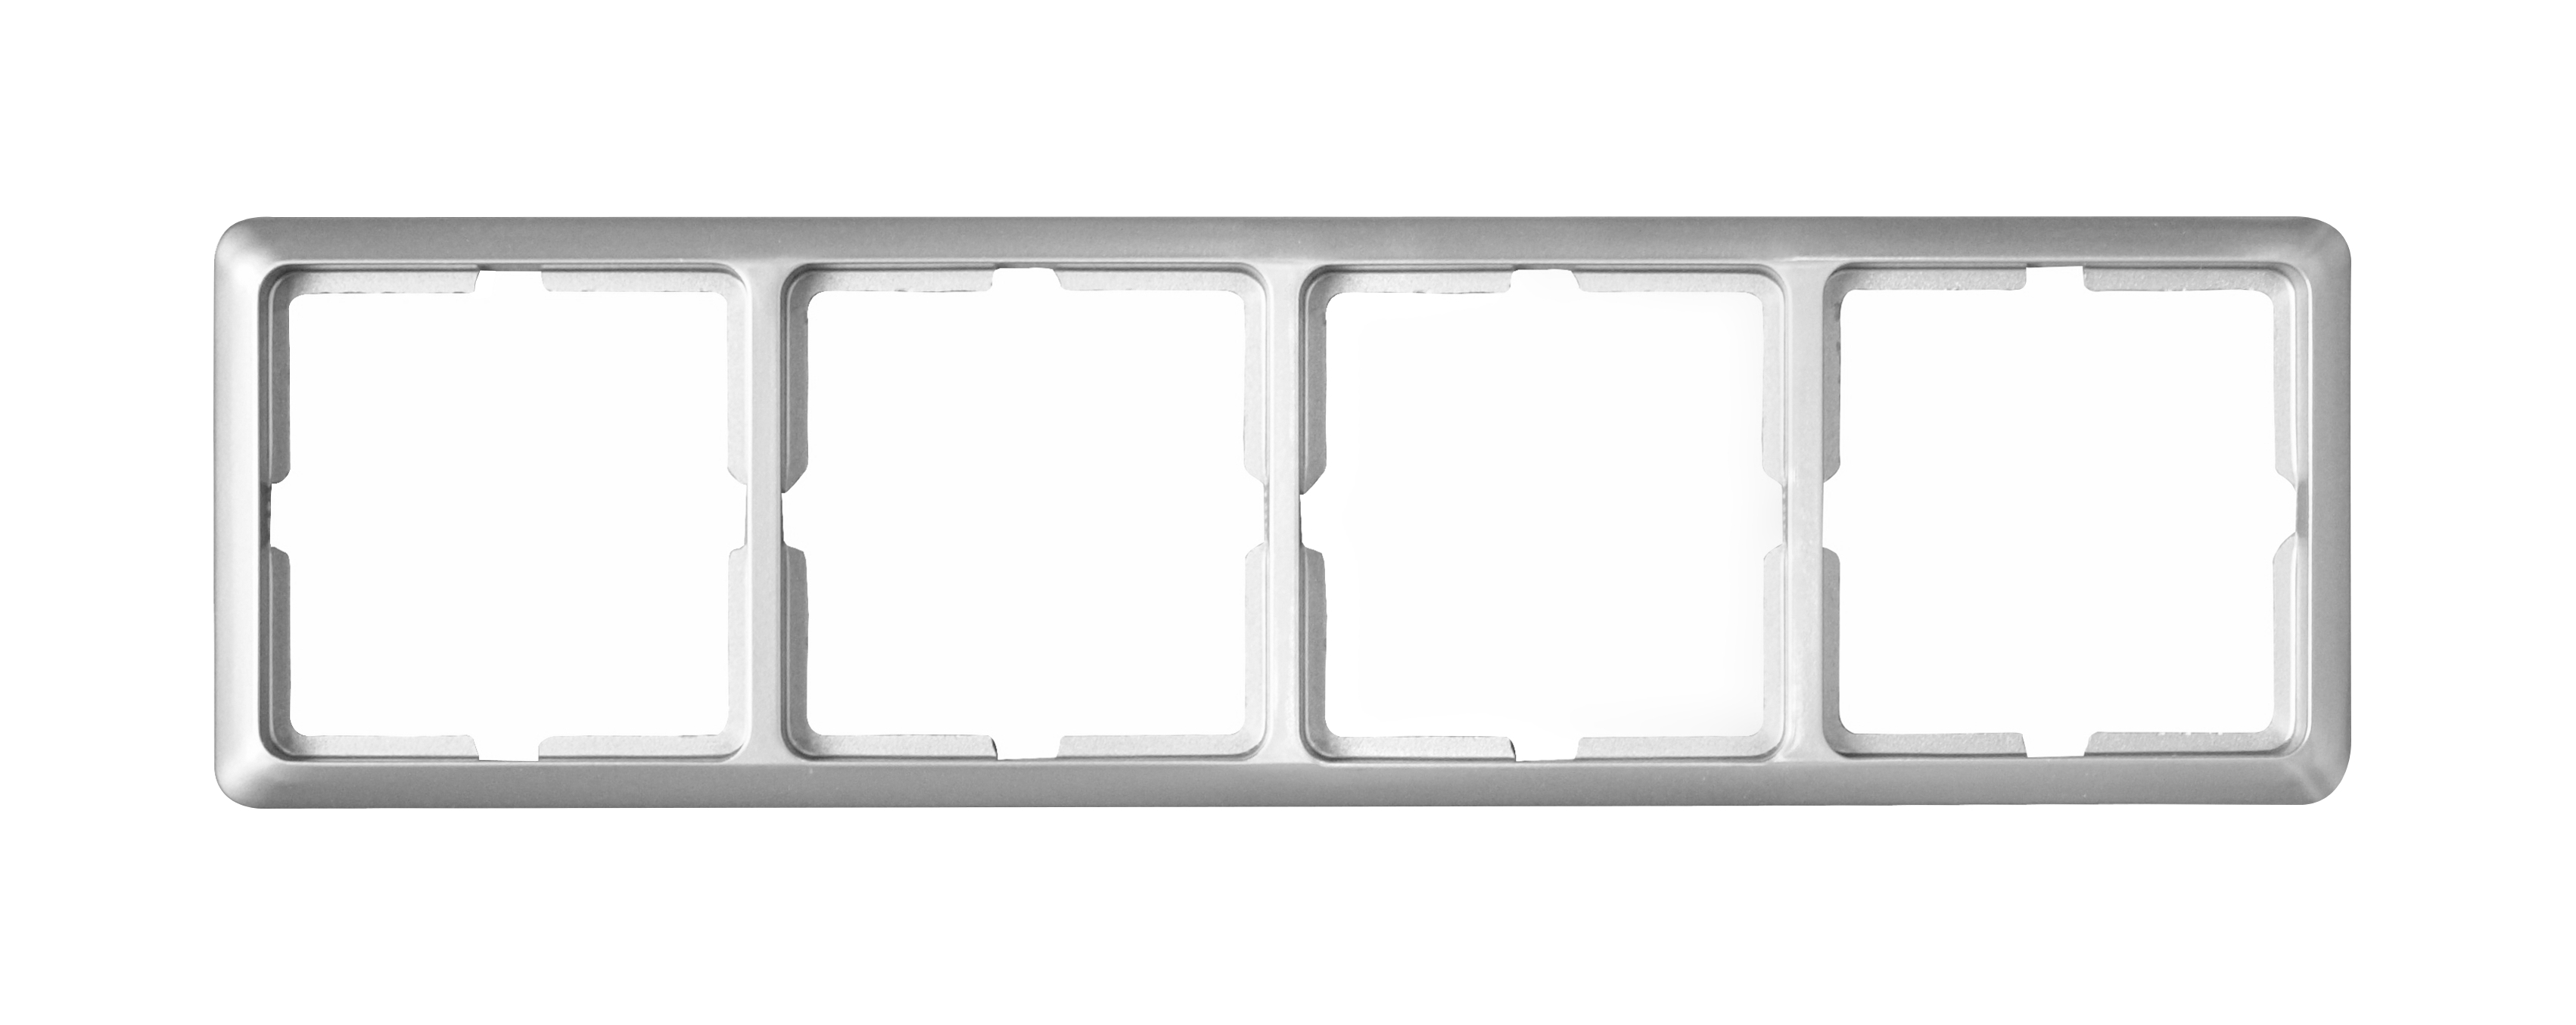 1 Stk Rahmen 4-fach, Edelstahleffekt Scala EL2044111-